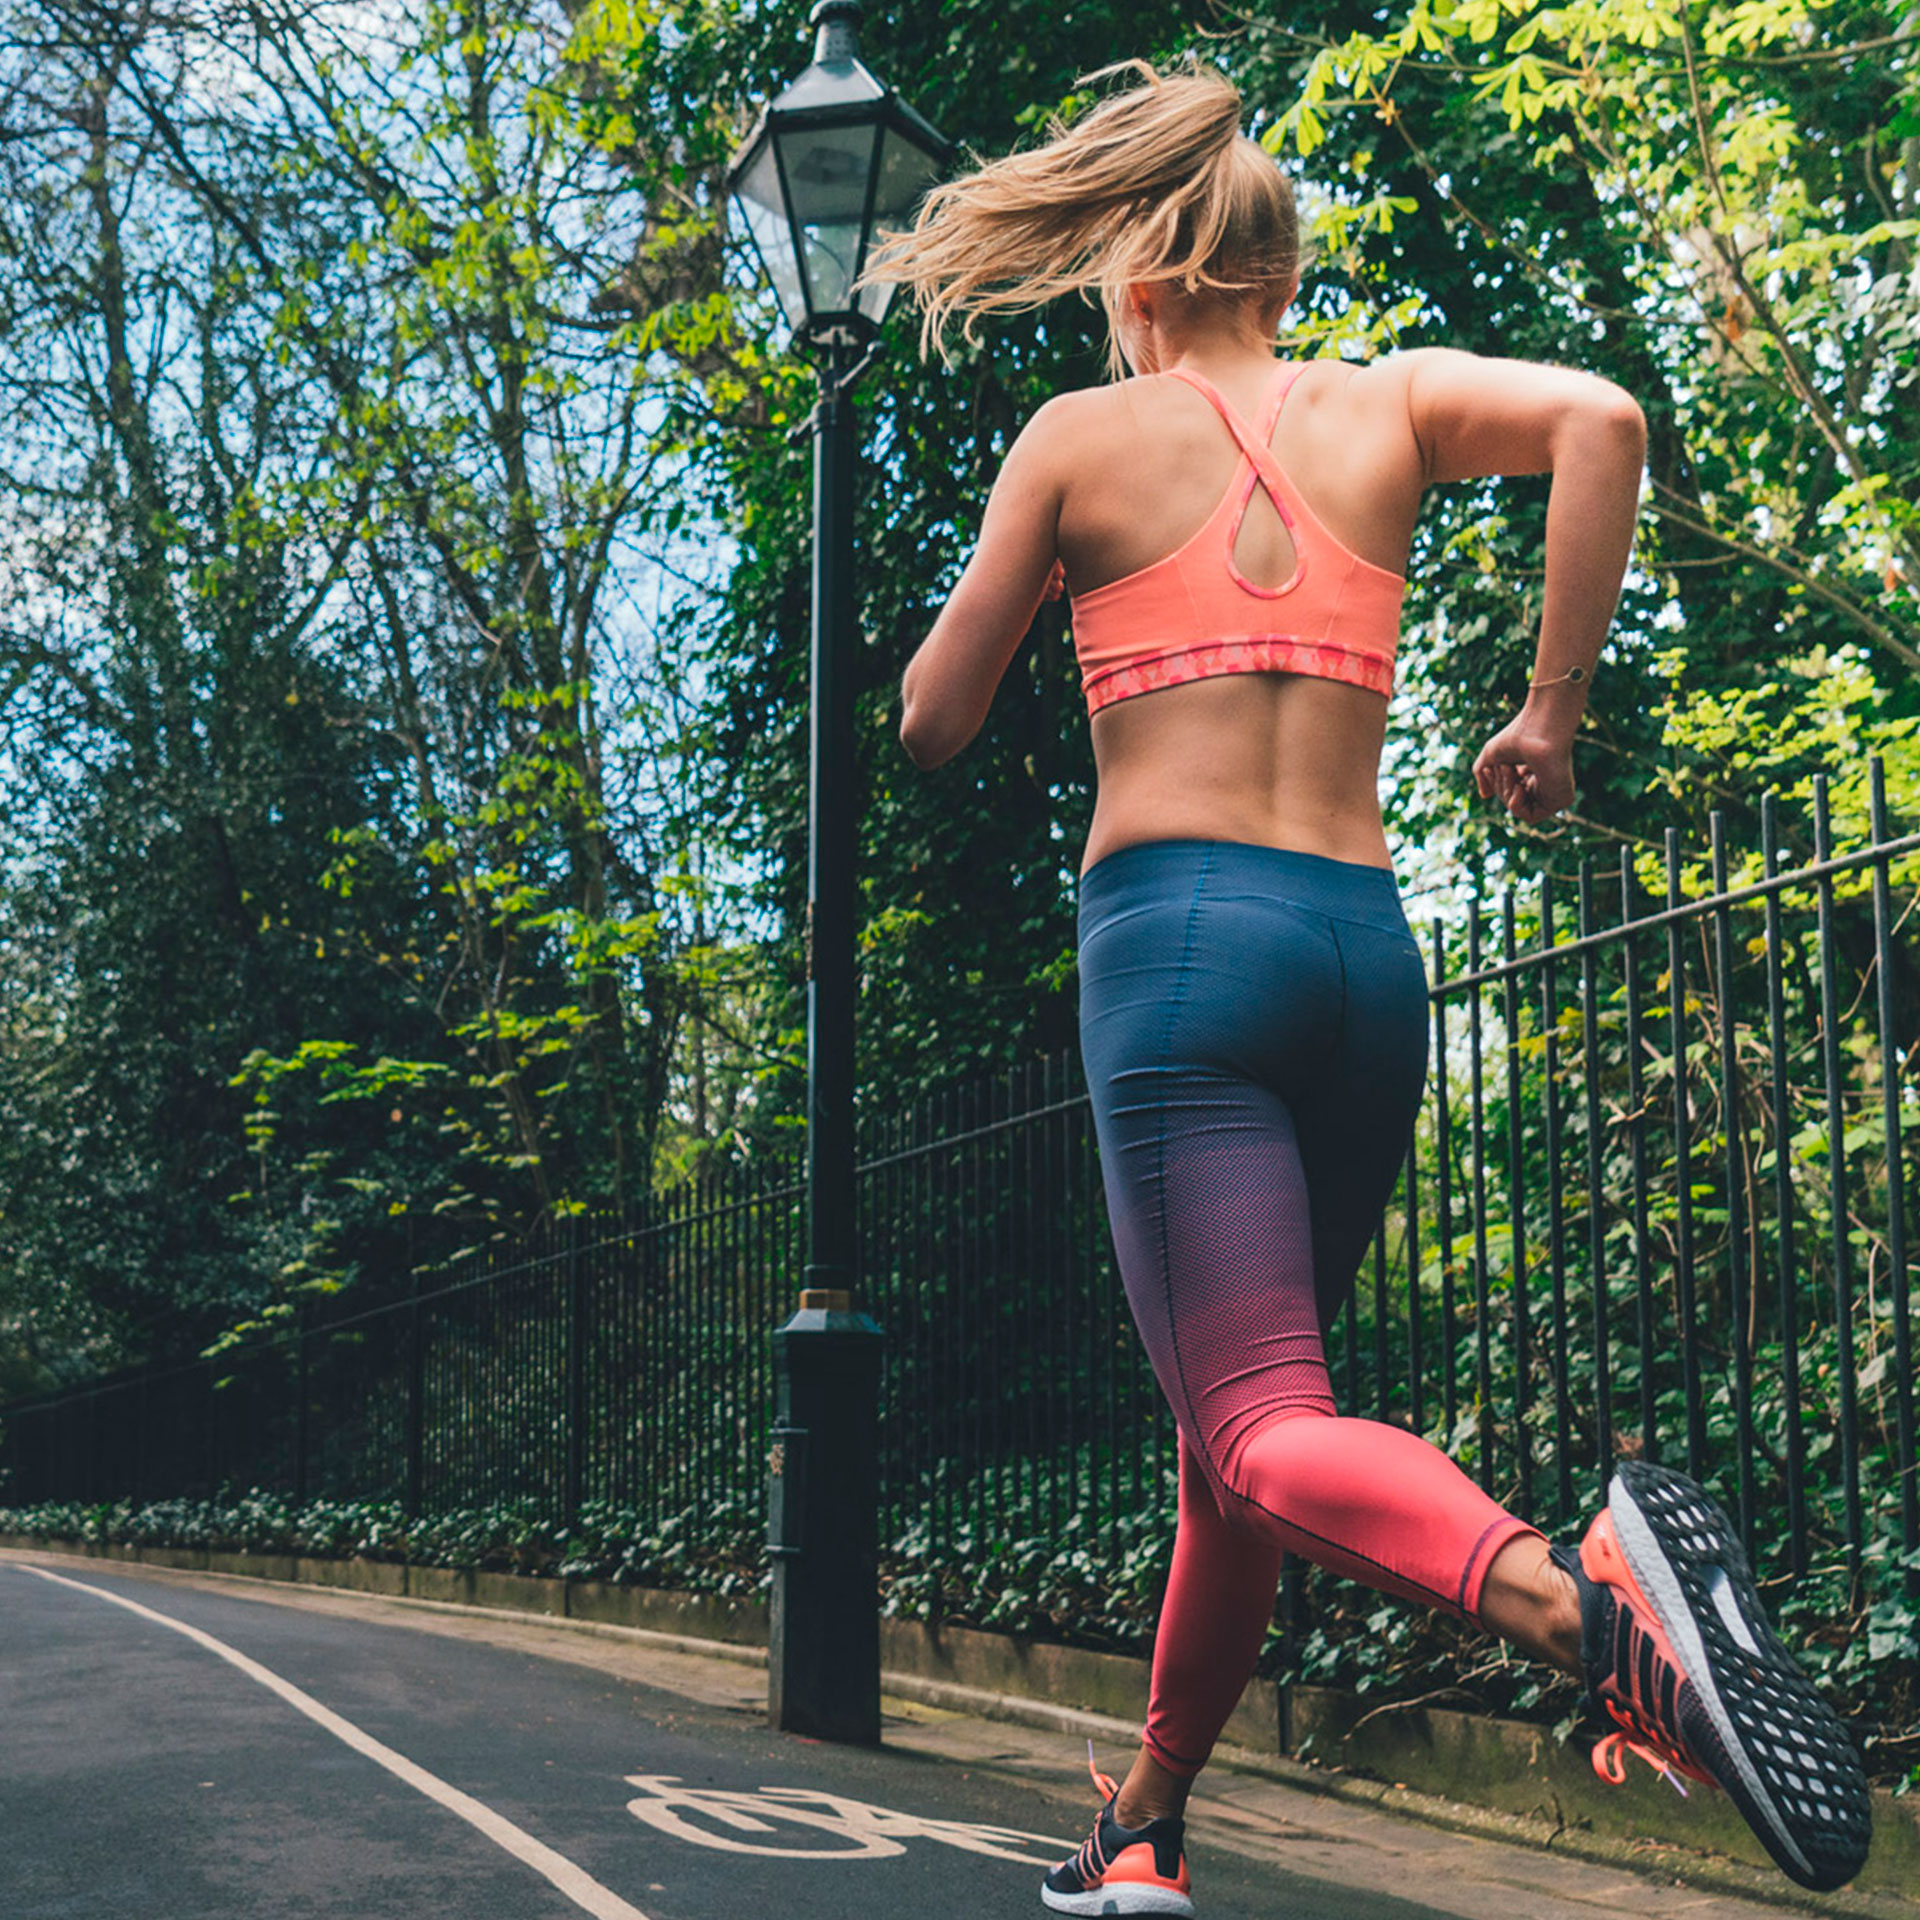 A woman wearing sports gear running along a path next to a park